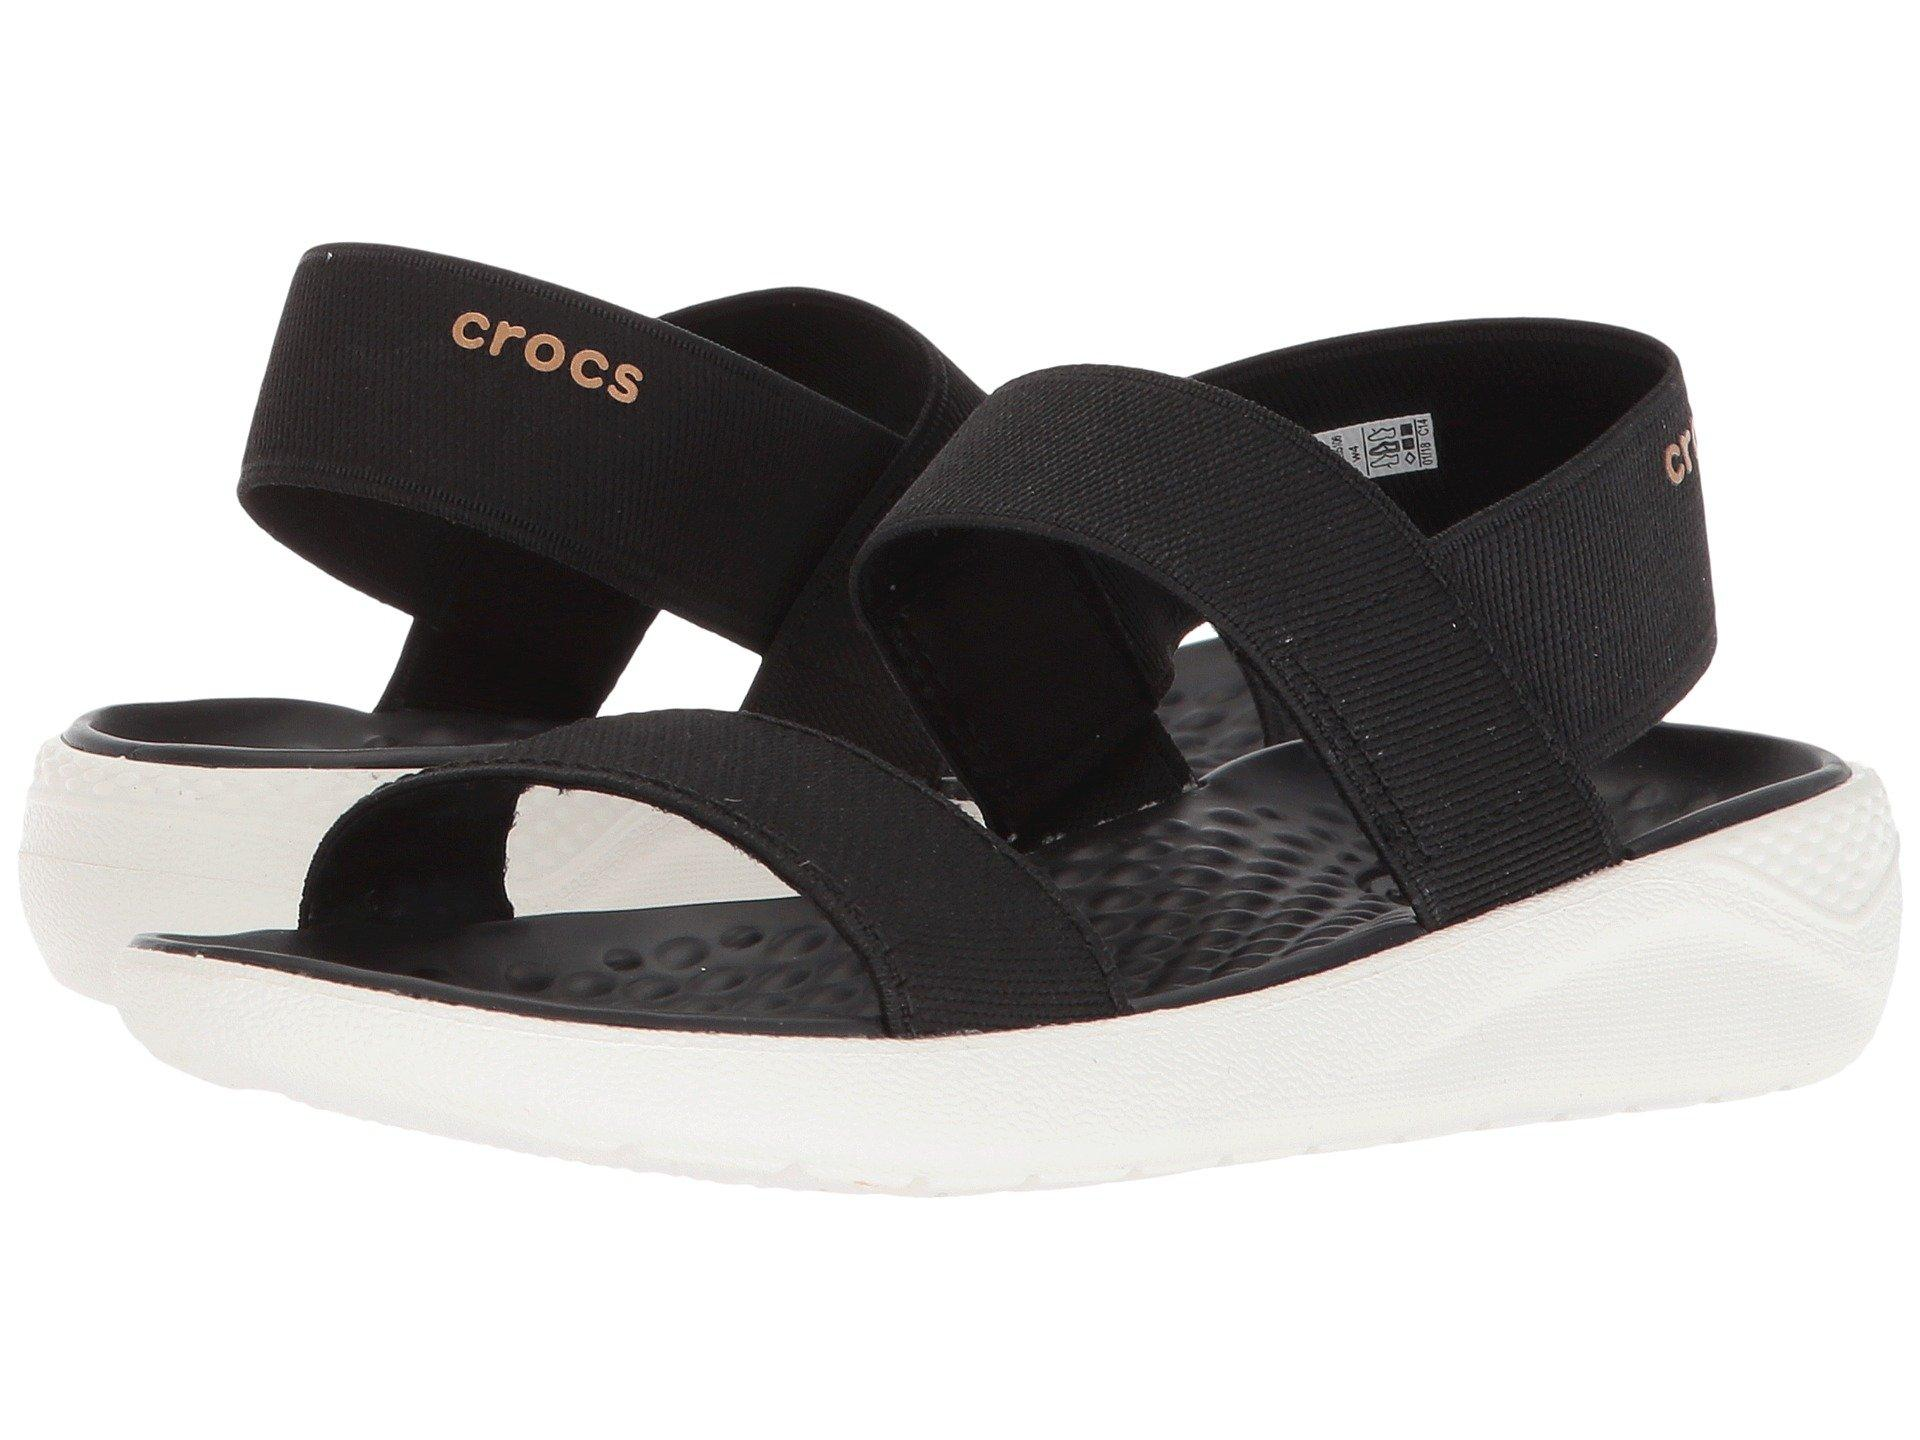 36c4a25bb835 Lyst - Crocs™ Literide Sandal (black black) Women s Shoes in Black